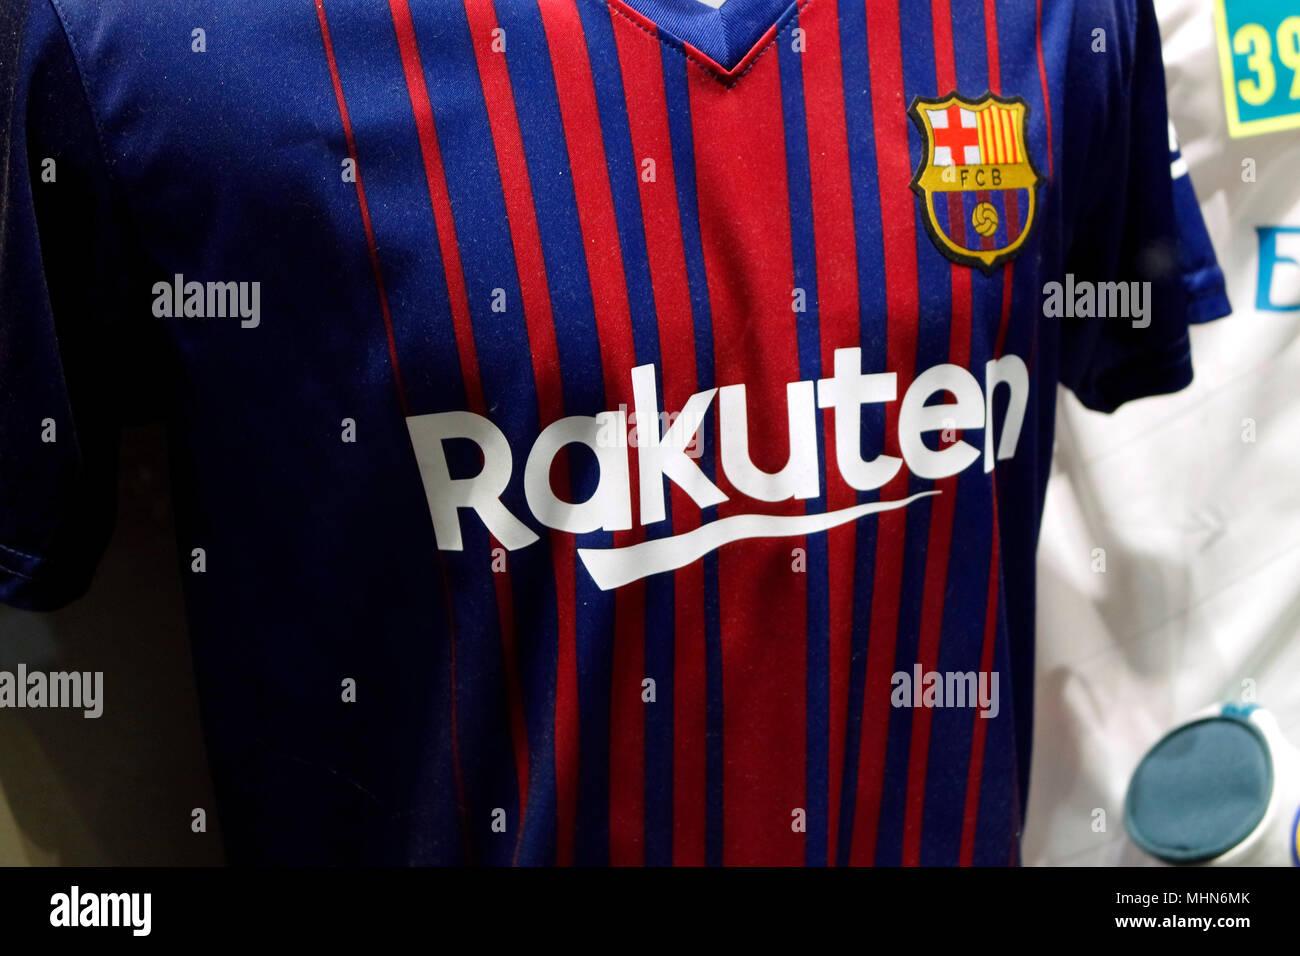 Logo der Marke/ logo of the brand 'Rakuten' auf dem Trikot des 'FC Barclona', Madrid. - Stock Image